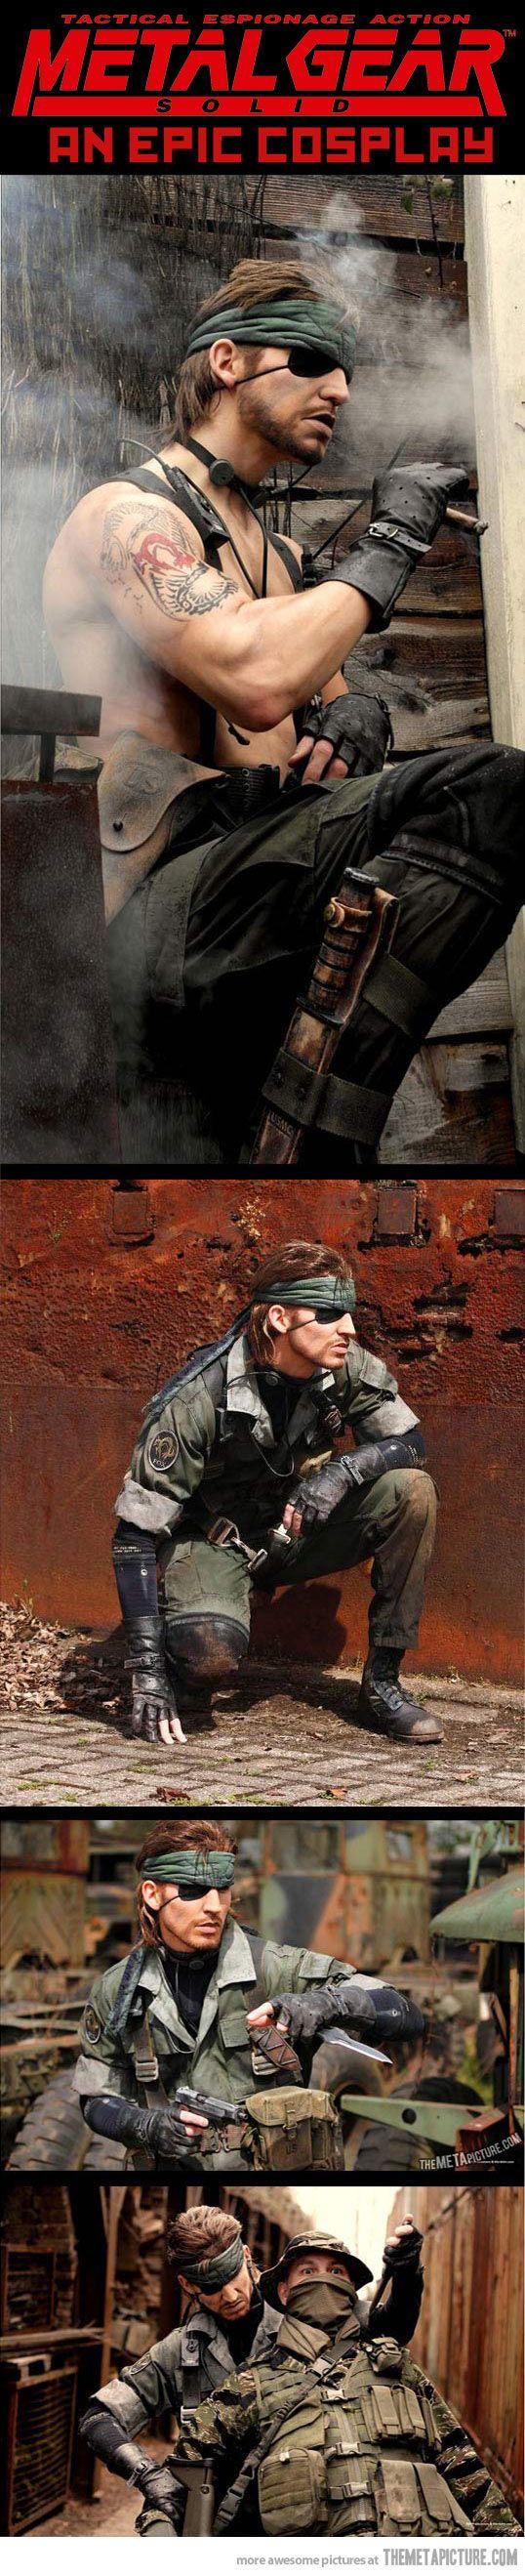 Metal Gear Solid Cosplay